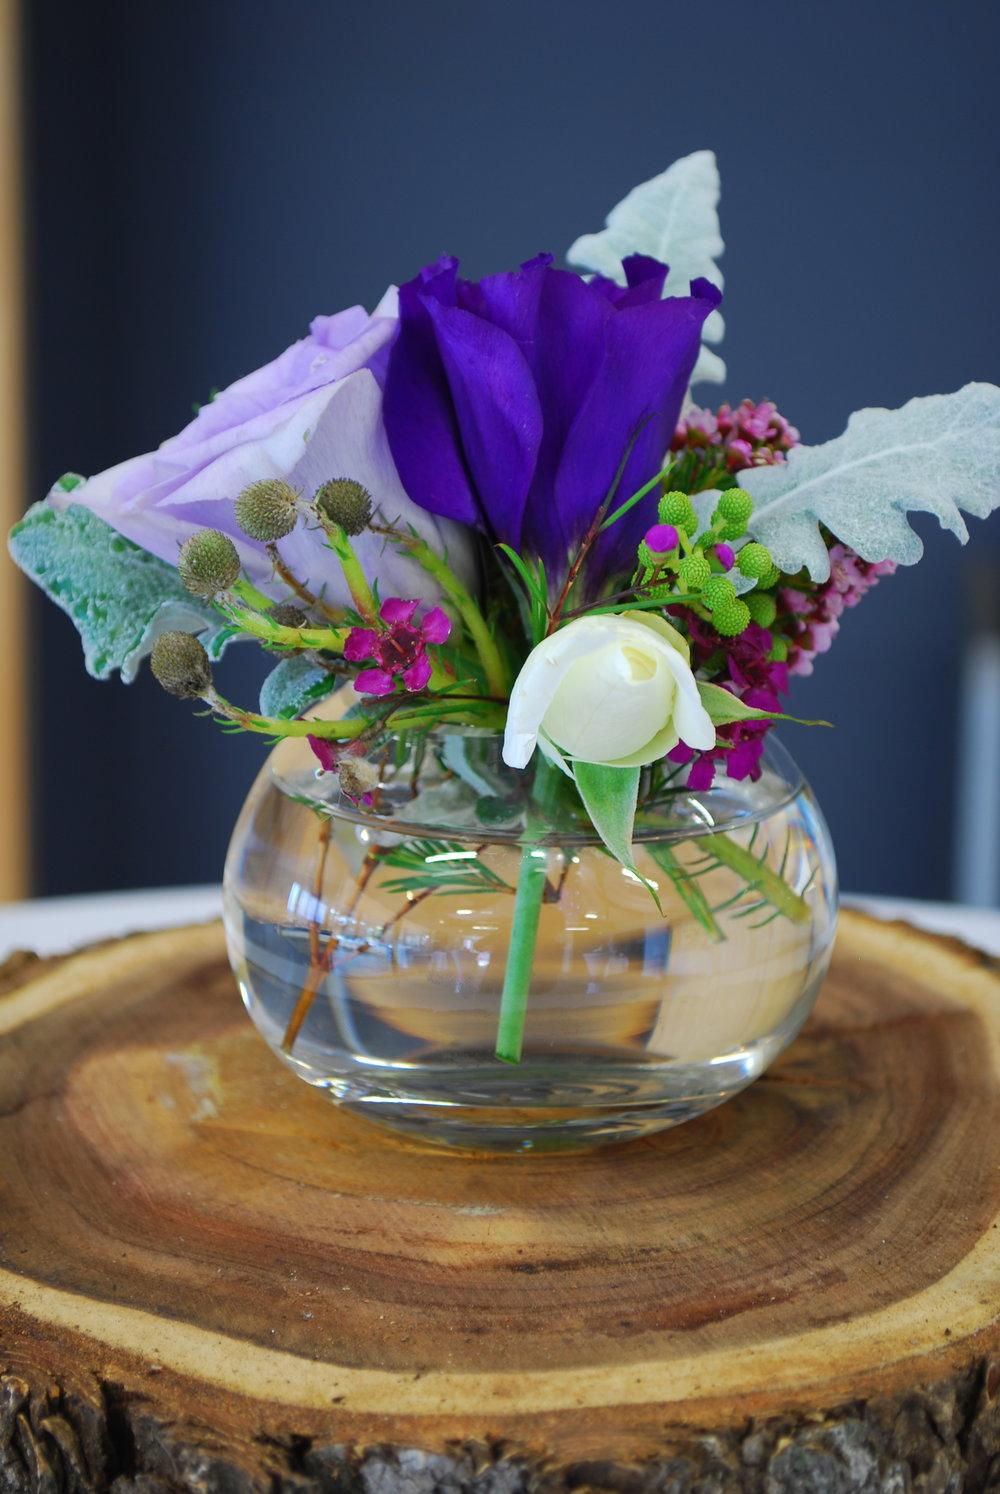 Wood base and vase of flowers